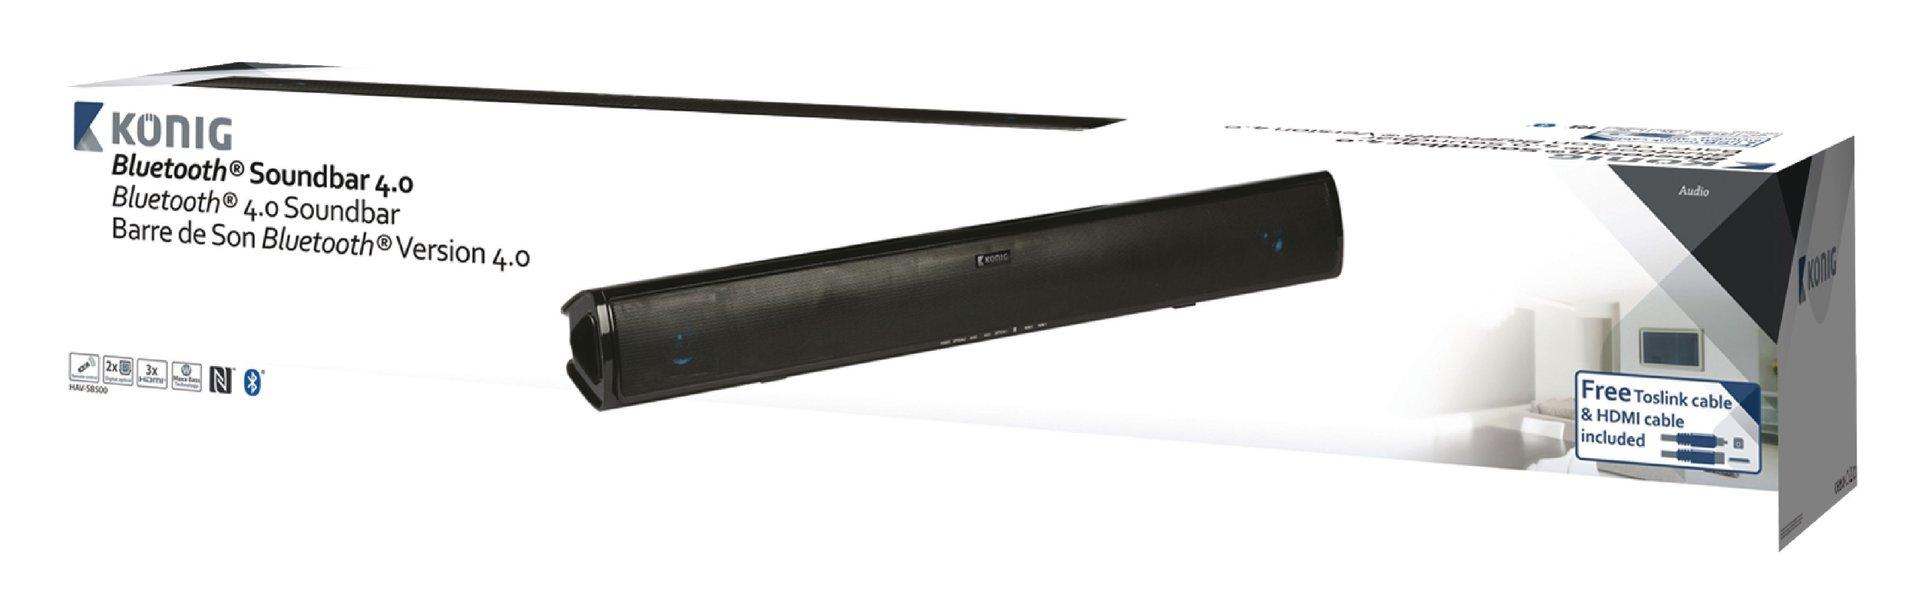 barre de son soundbar 2 1 bluetooth 4 0 300w 60w rms aervi. Black Bedroom Furniture Sets. Home Design Ideas